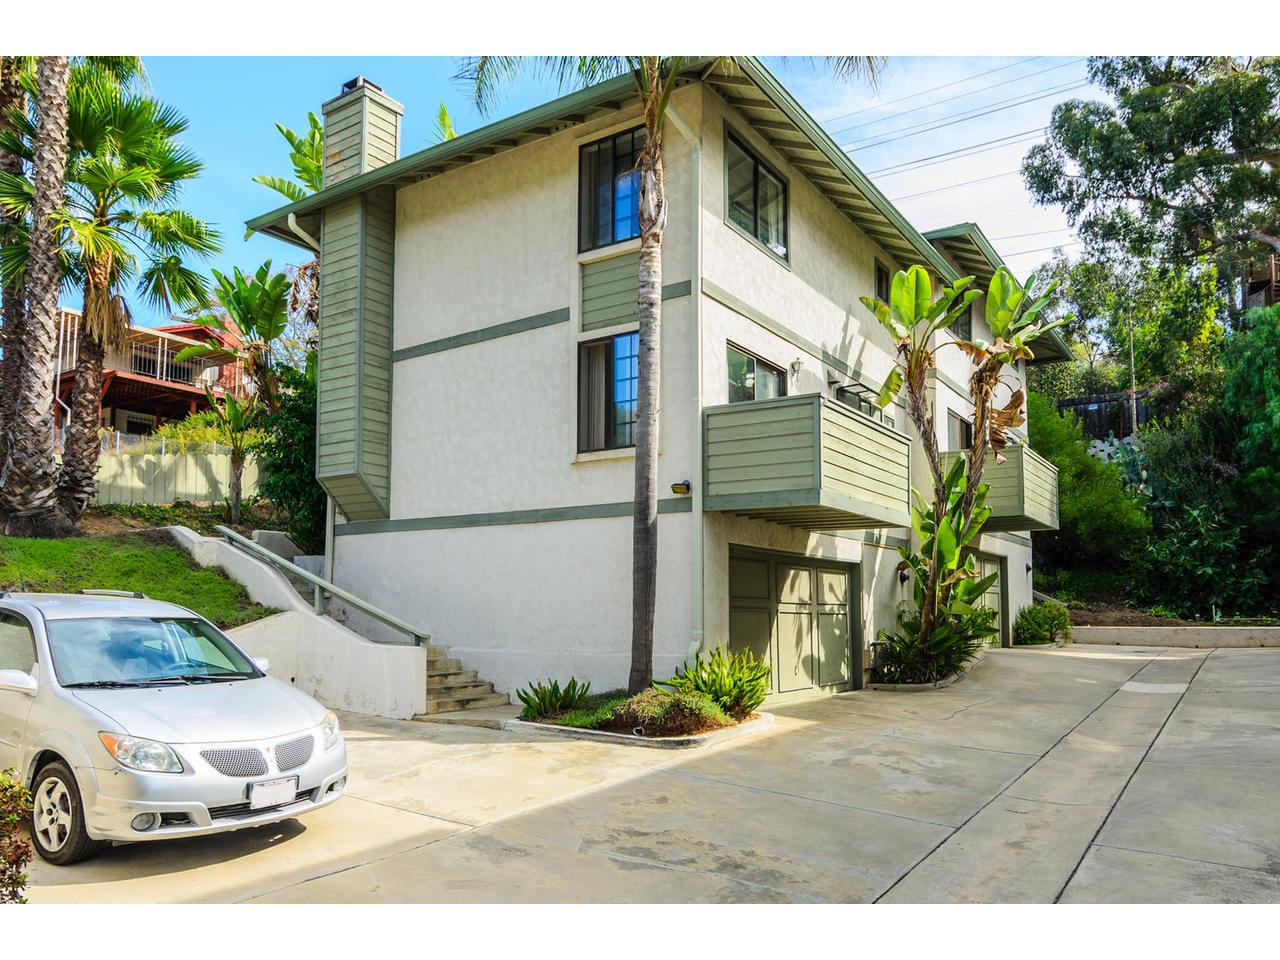 3579 Curlew Street San Diego-MLS_Size-002-3579 Curlew Street San Diego-1280x960-72dpi.jpg